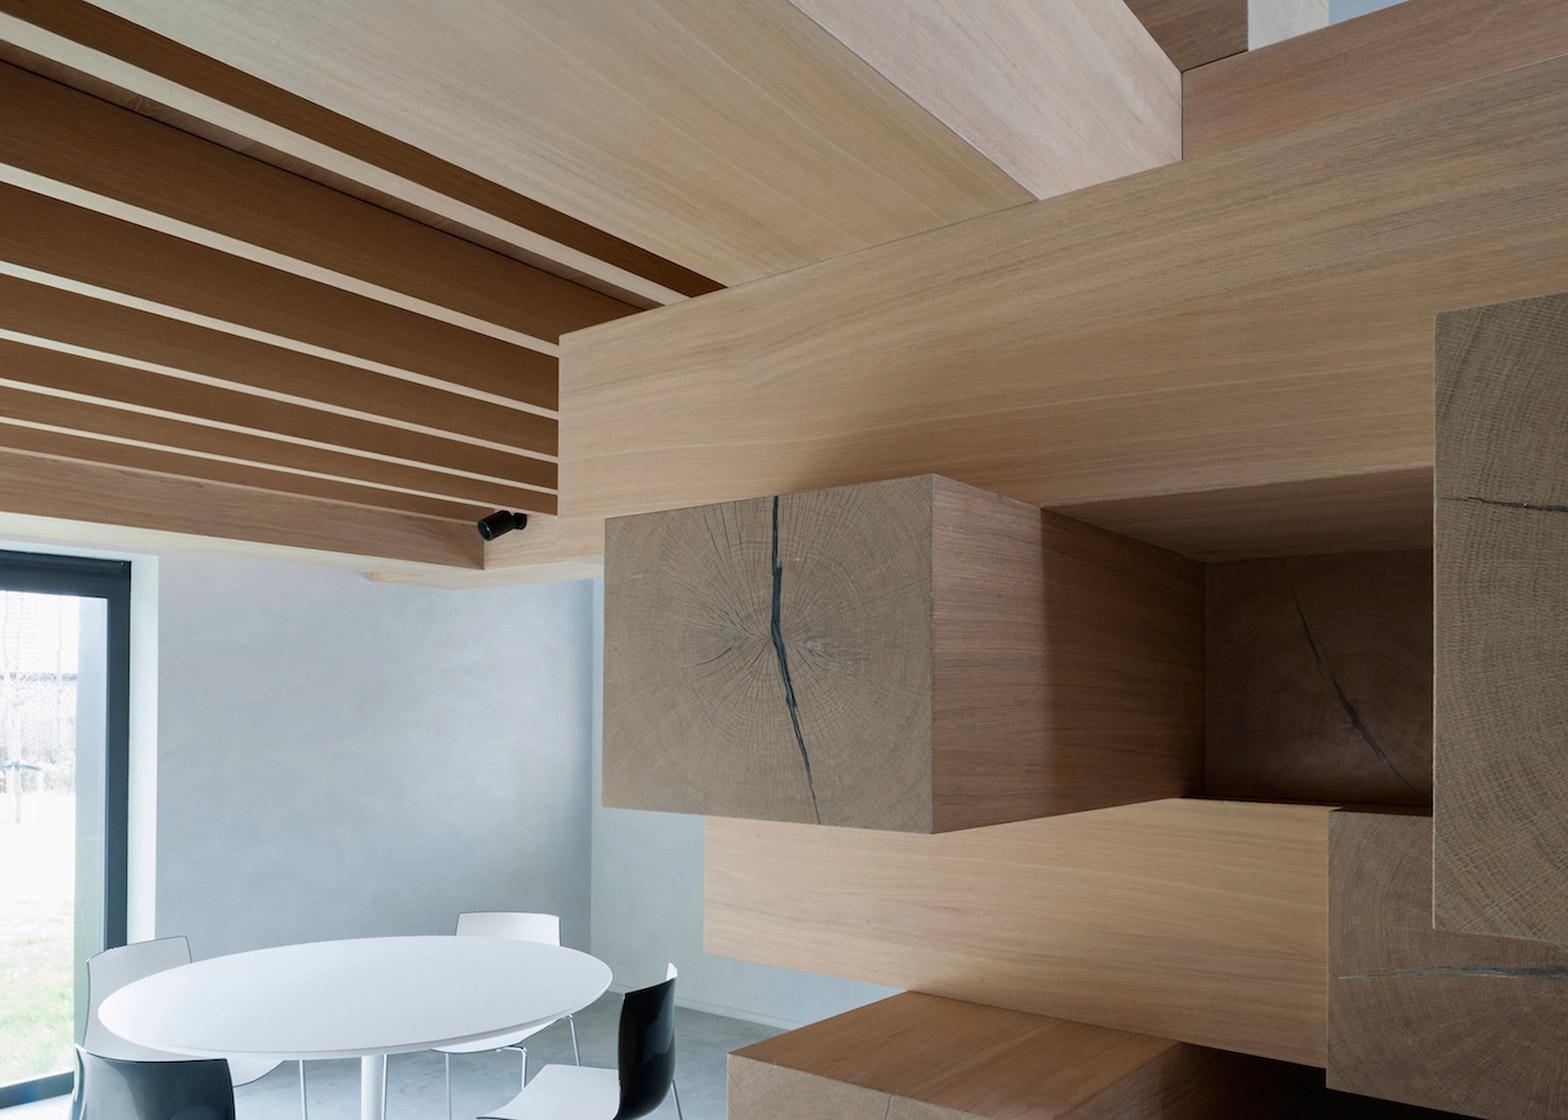 architecture_wood_office_design_studia_interiors_osnovadesign_osnova_poltava_03